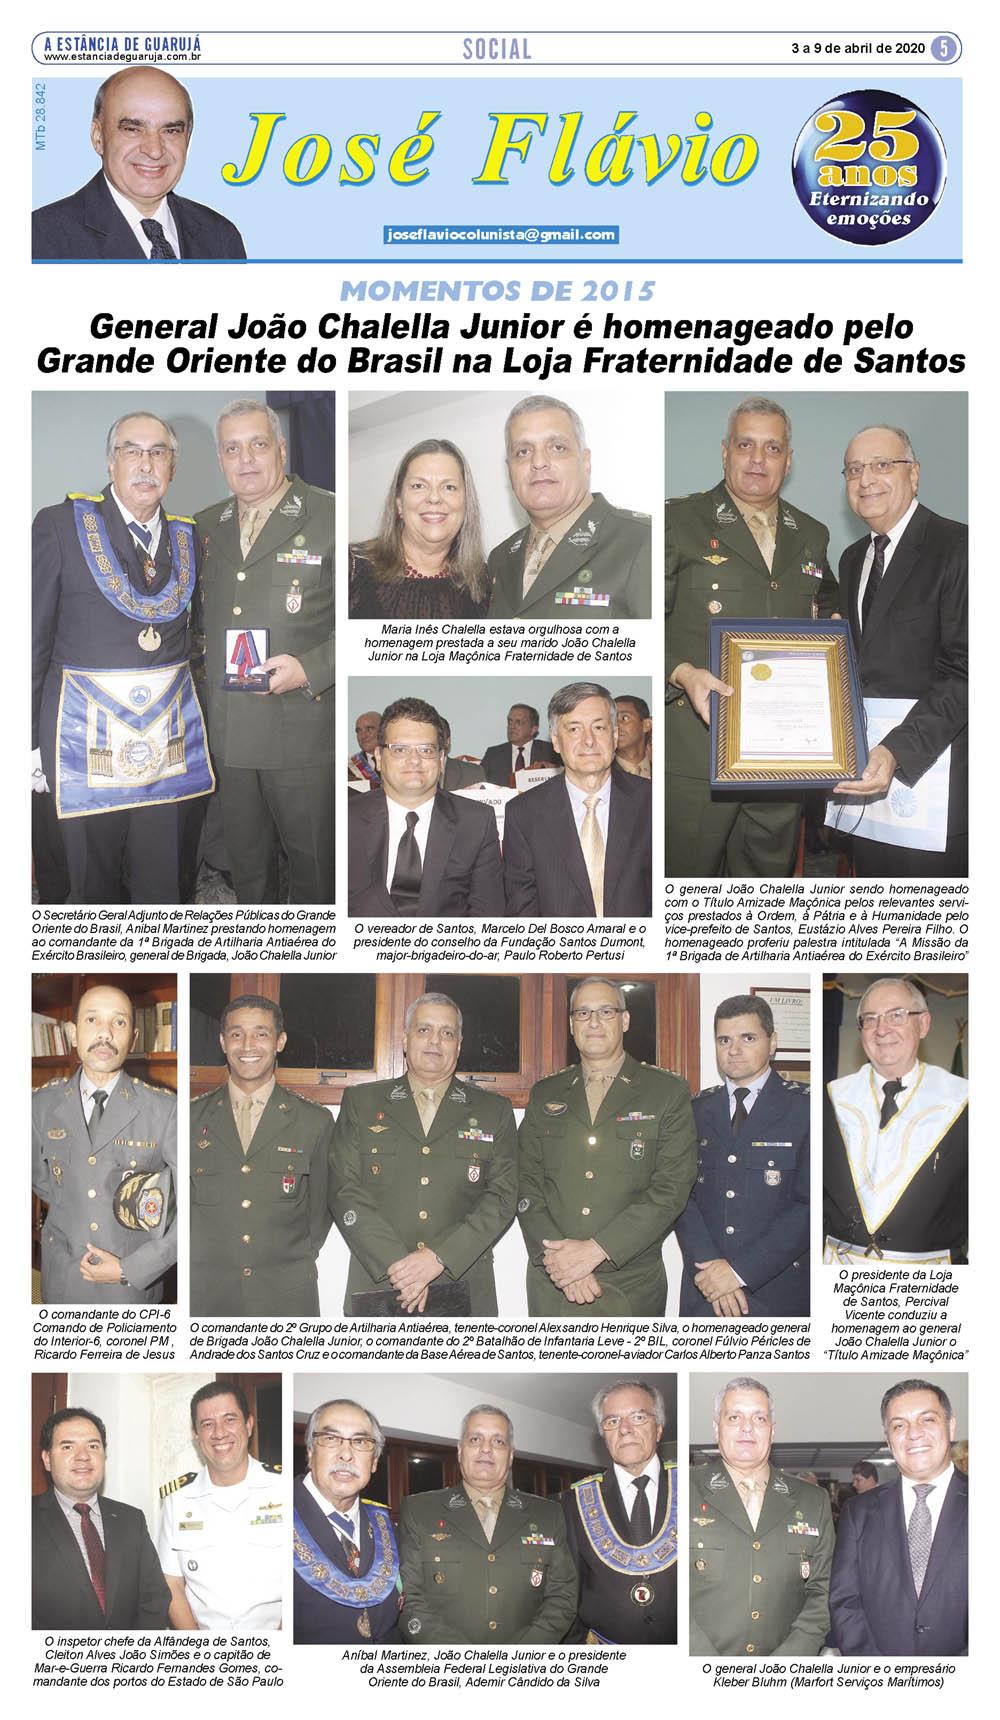 General João Chalella Junior recebe homenagem